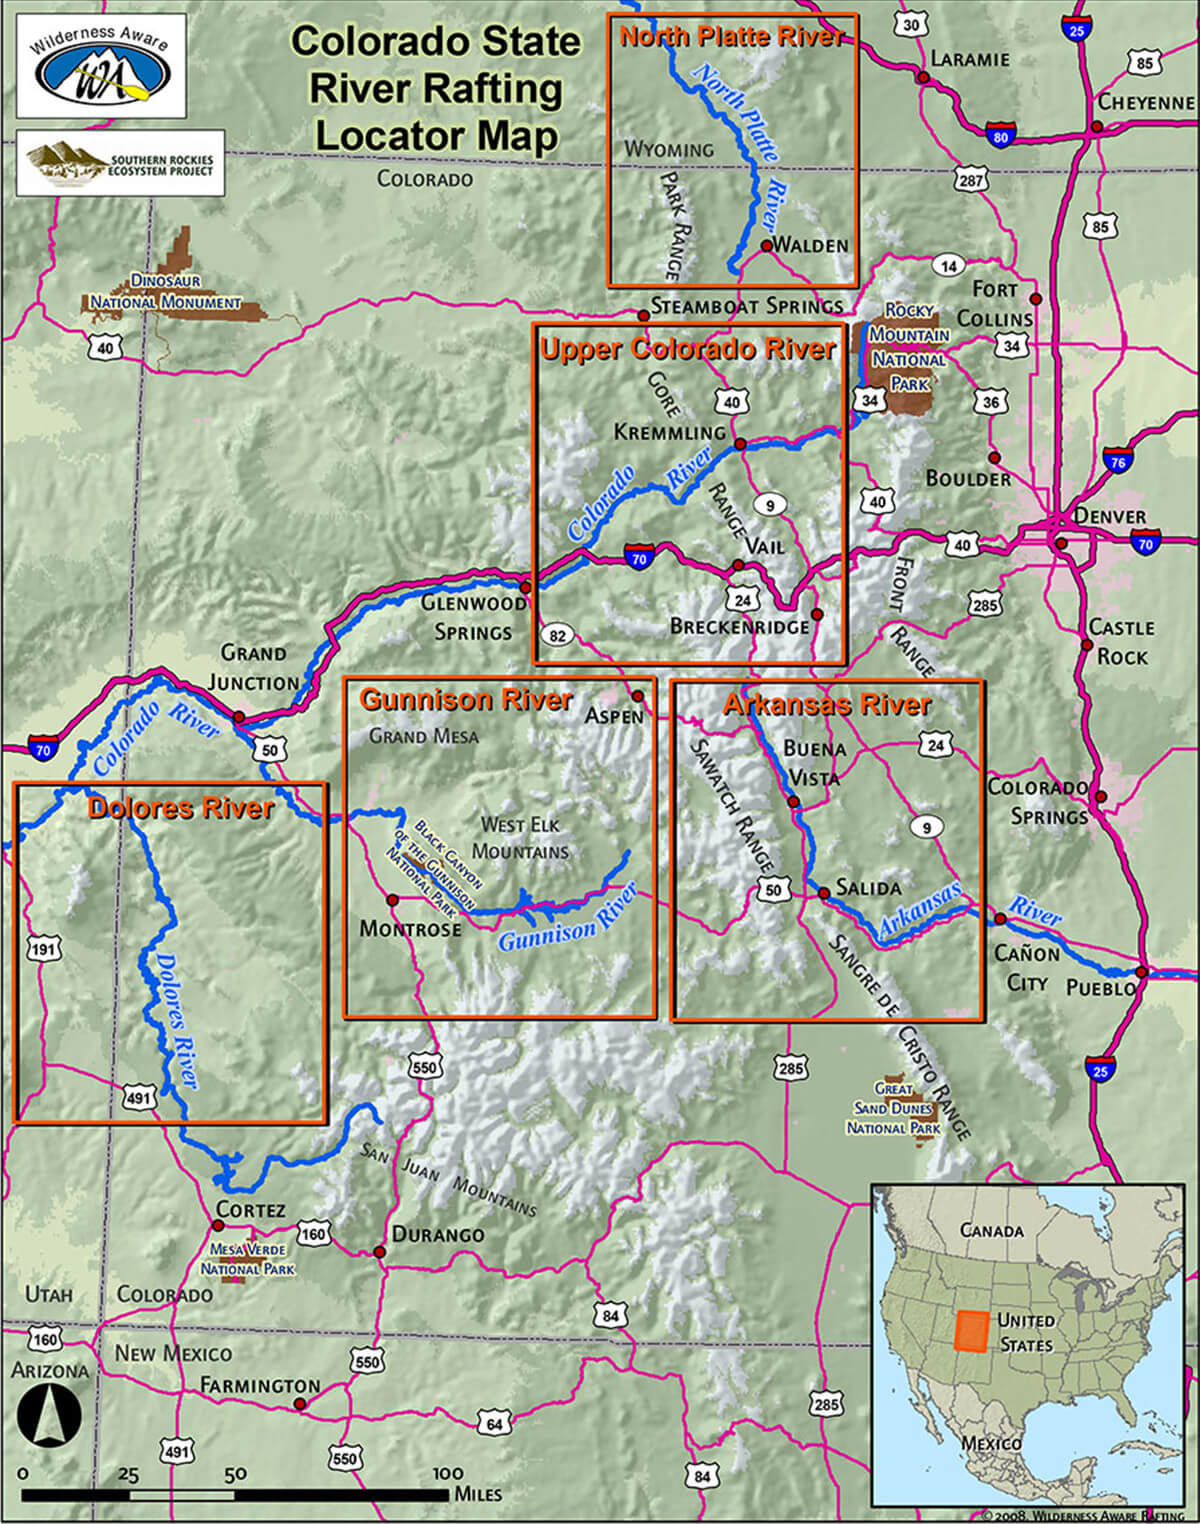 Colorado State River Locator Map Wilderness Aware